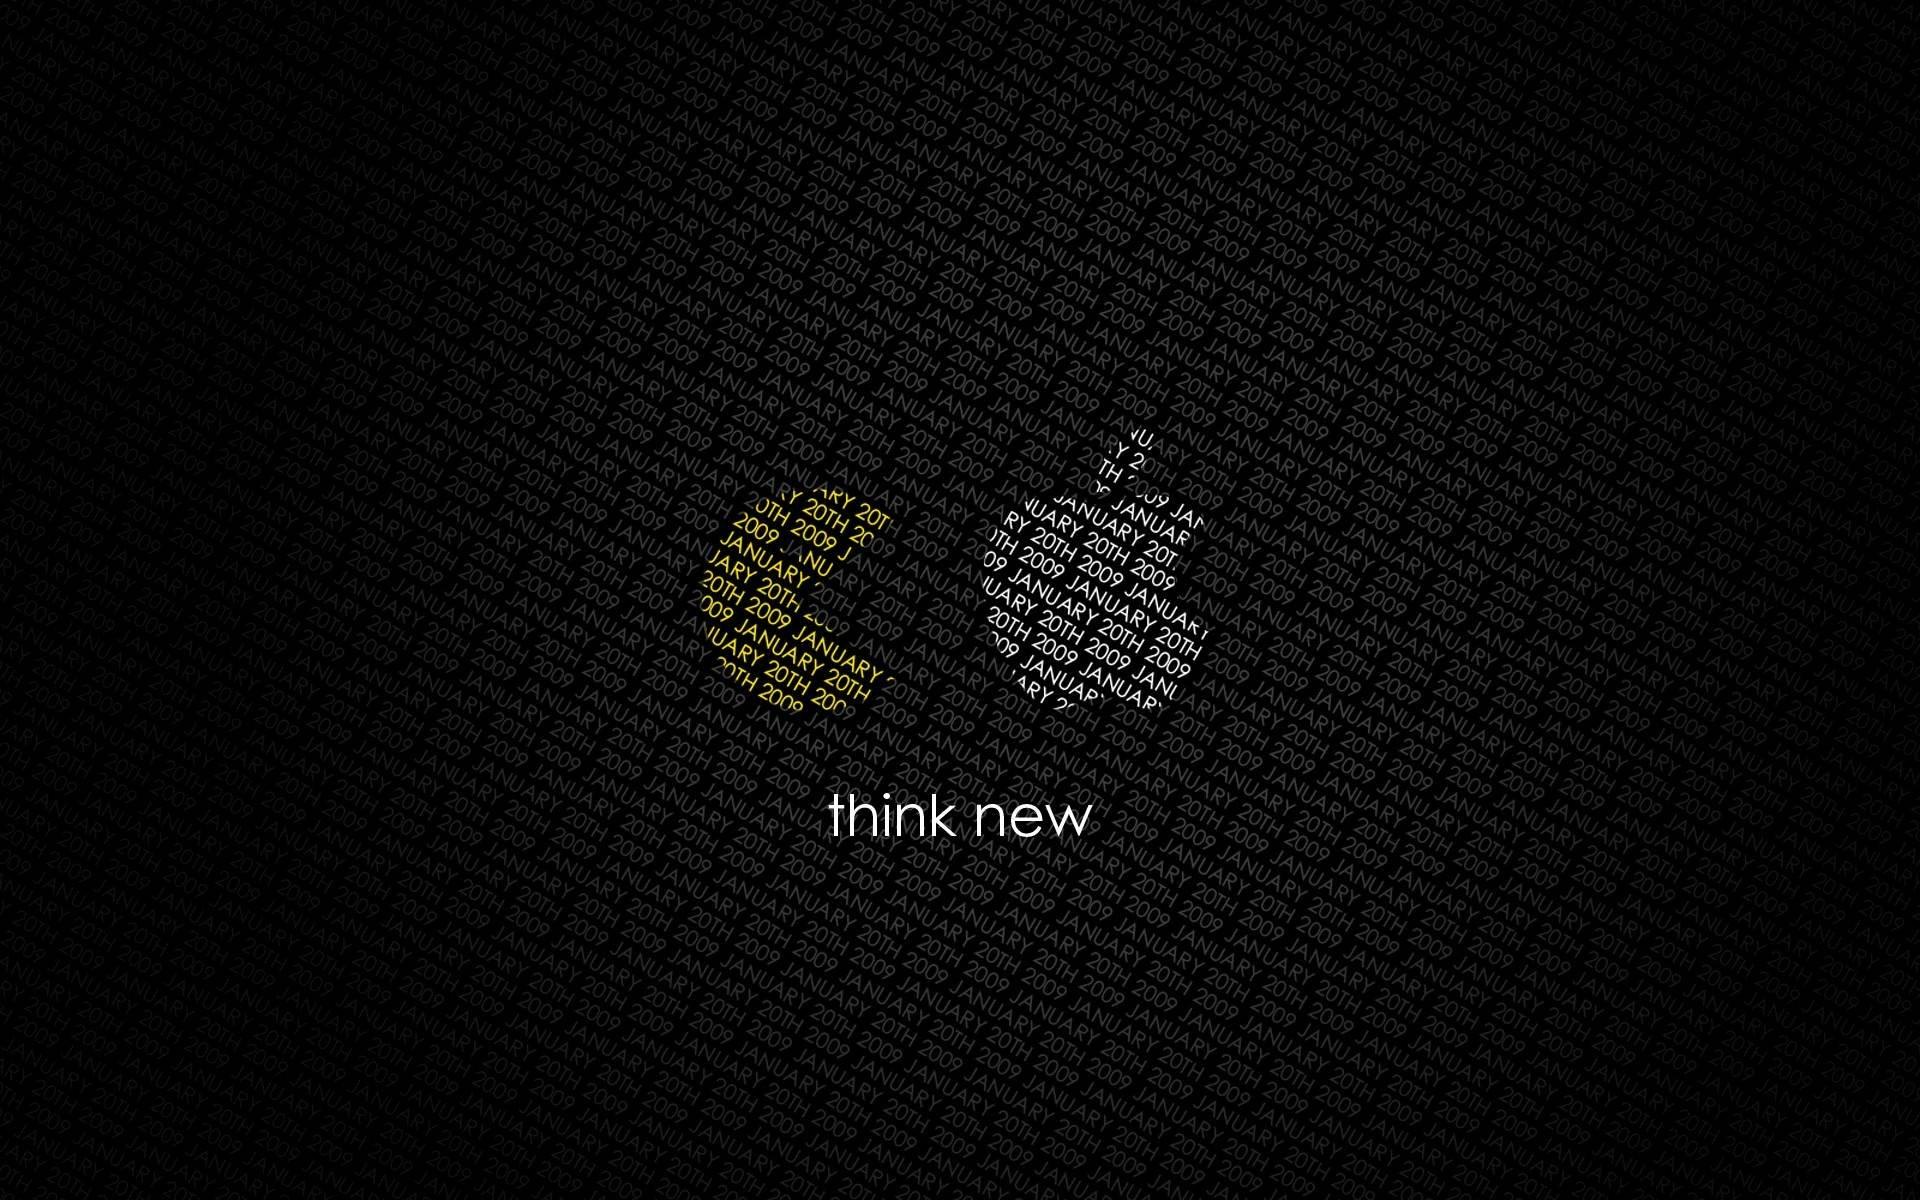 Thinkpad 280310